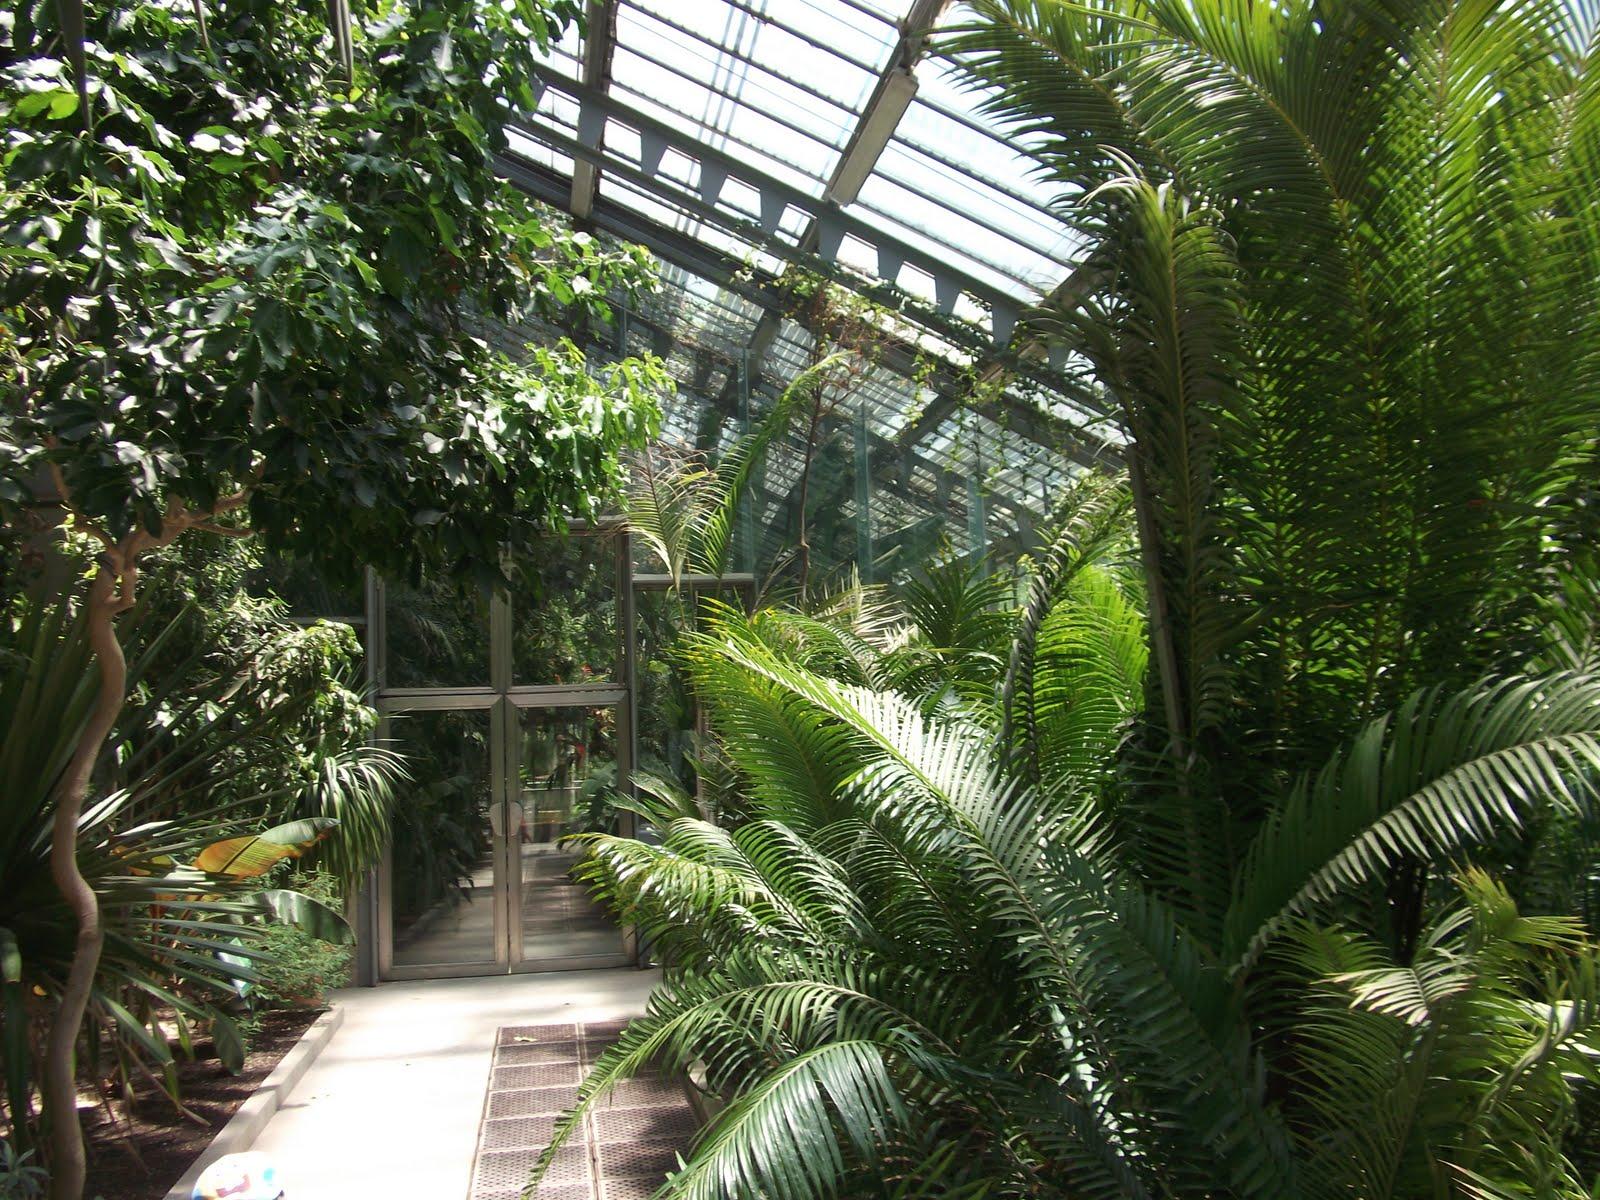 Blognatura jardin botanico de madrid madrid s botanical for Entrada jardin botanico madrid